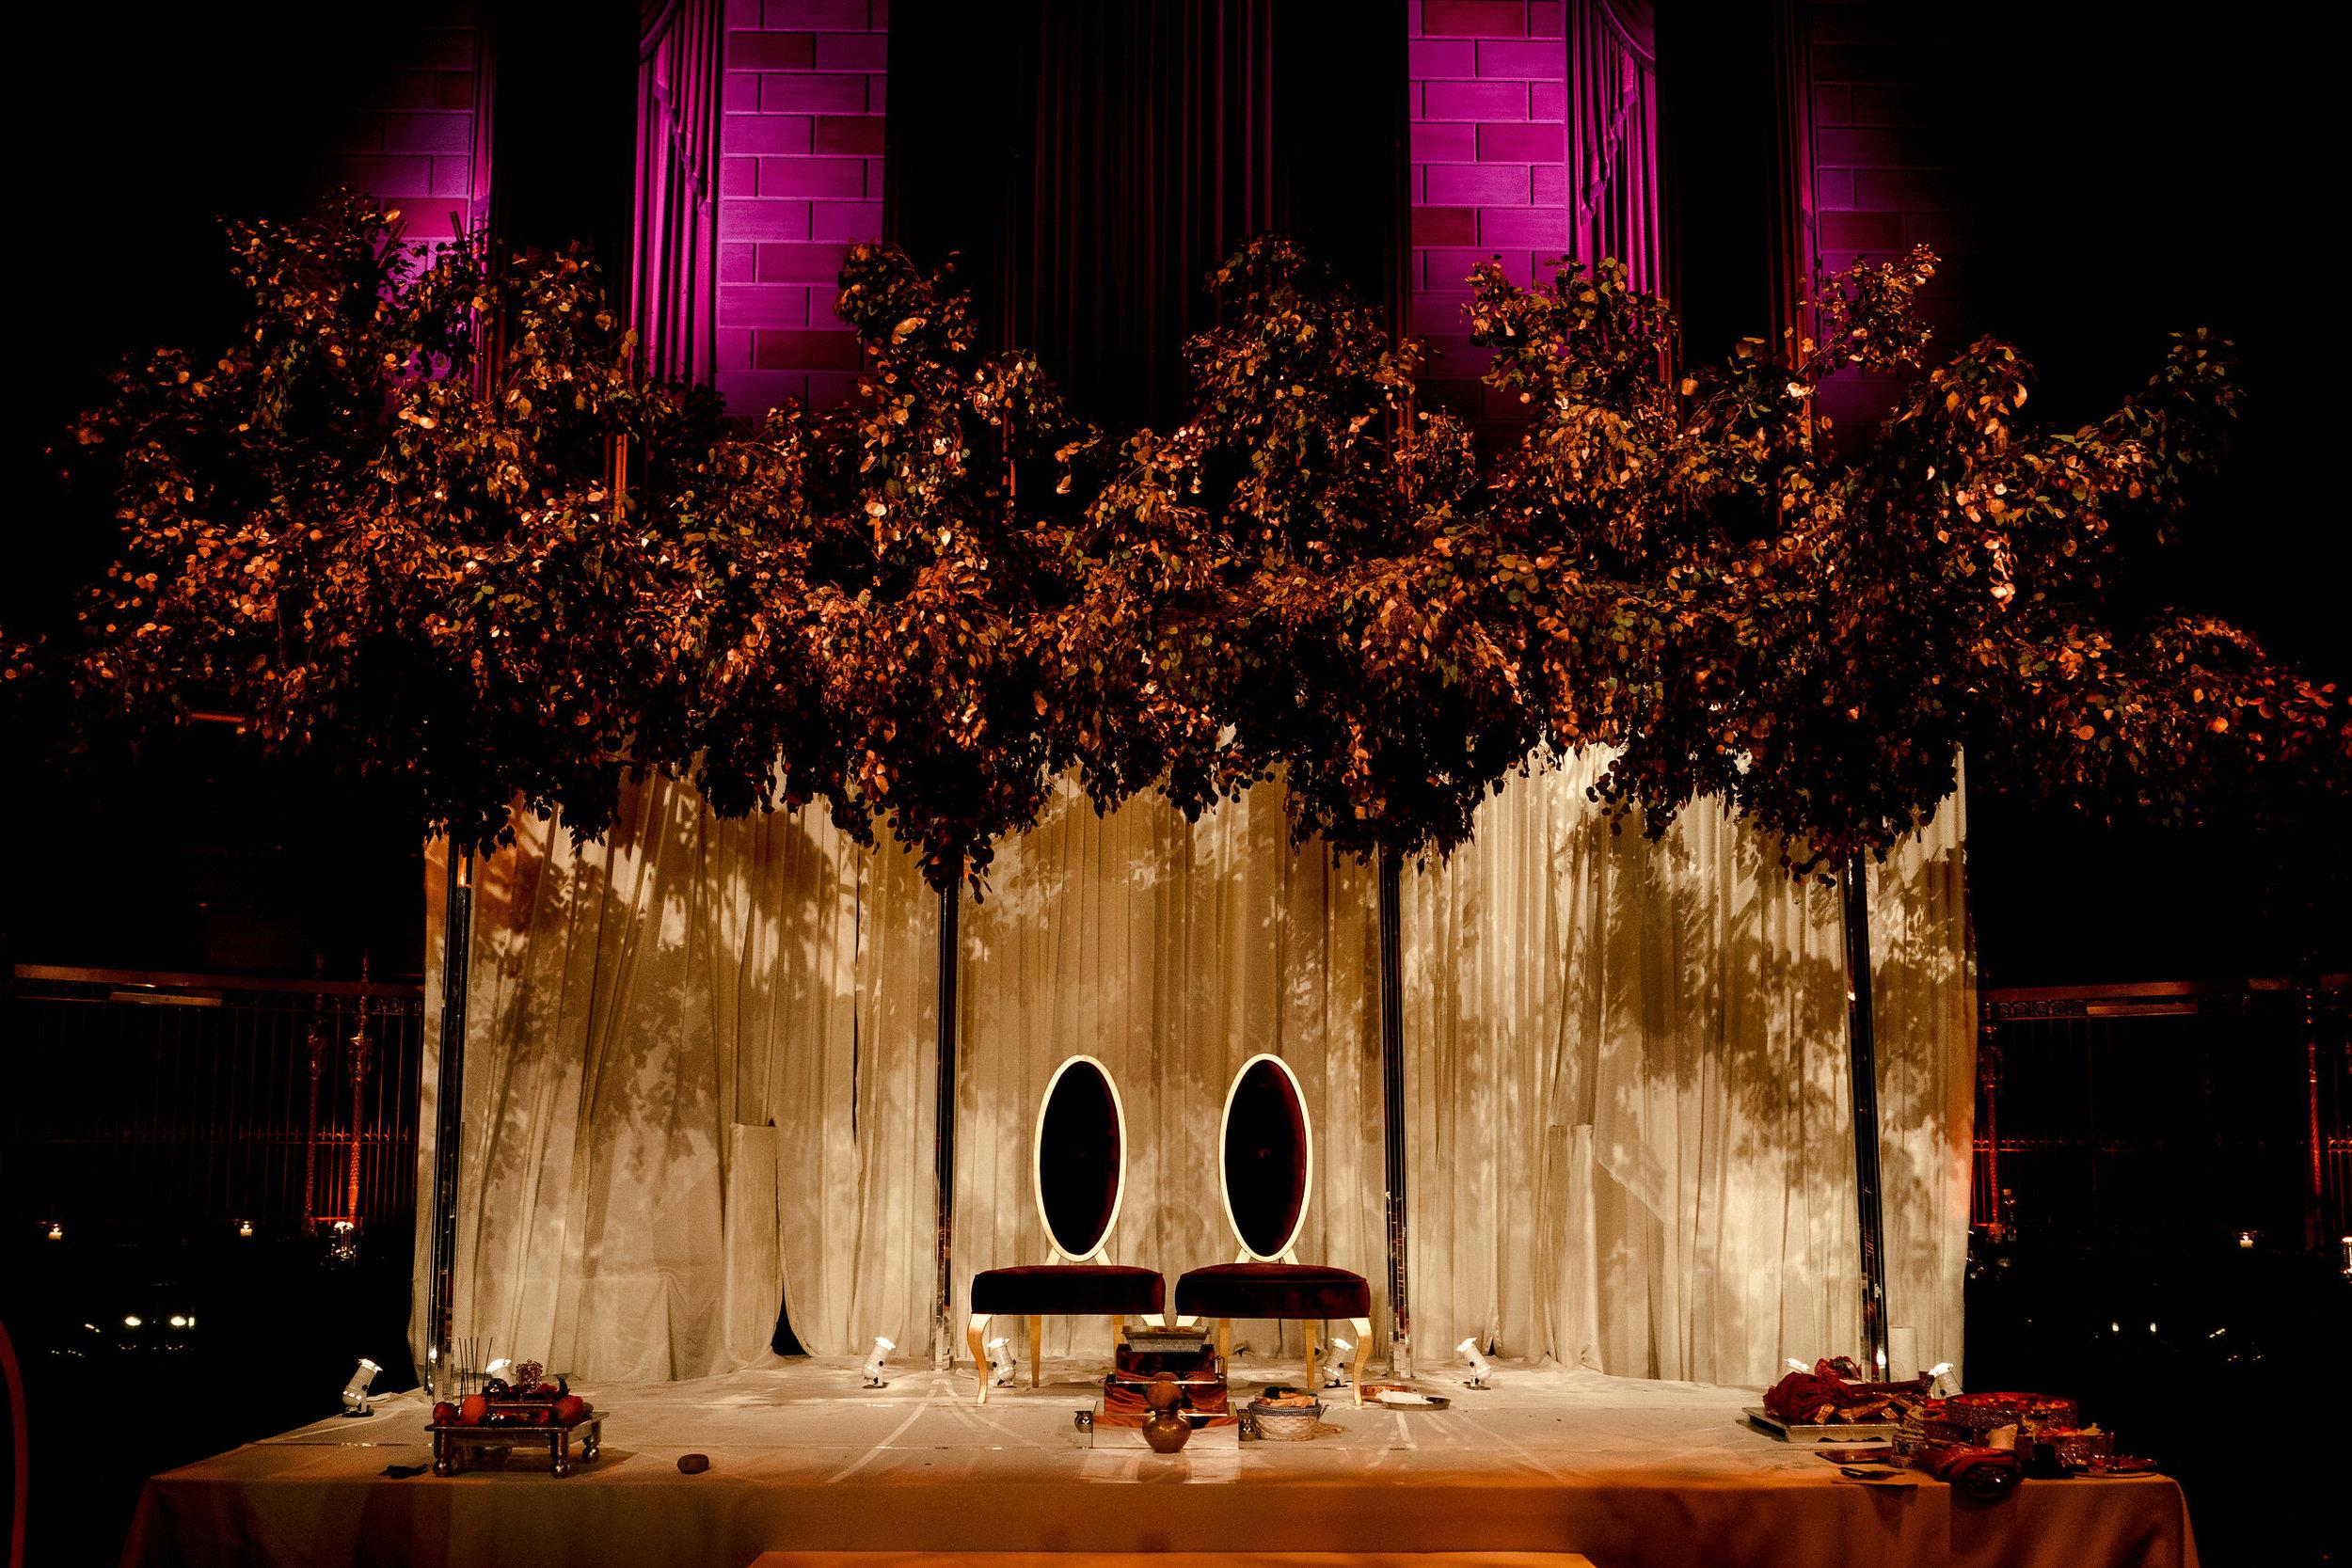 INDIAN WEDDING CEREMONY VENUE2.JPG